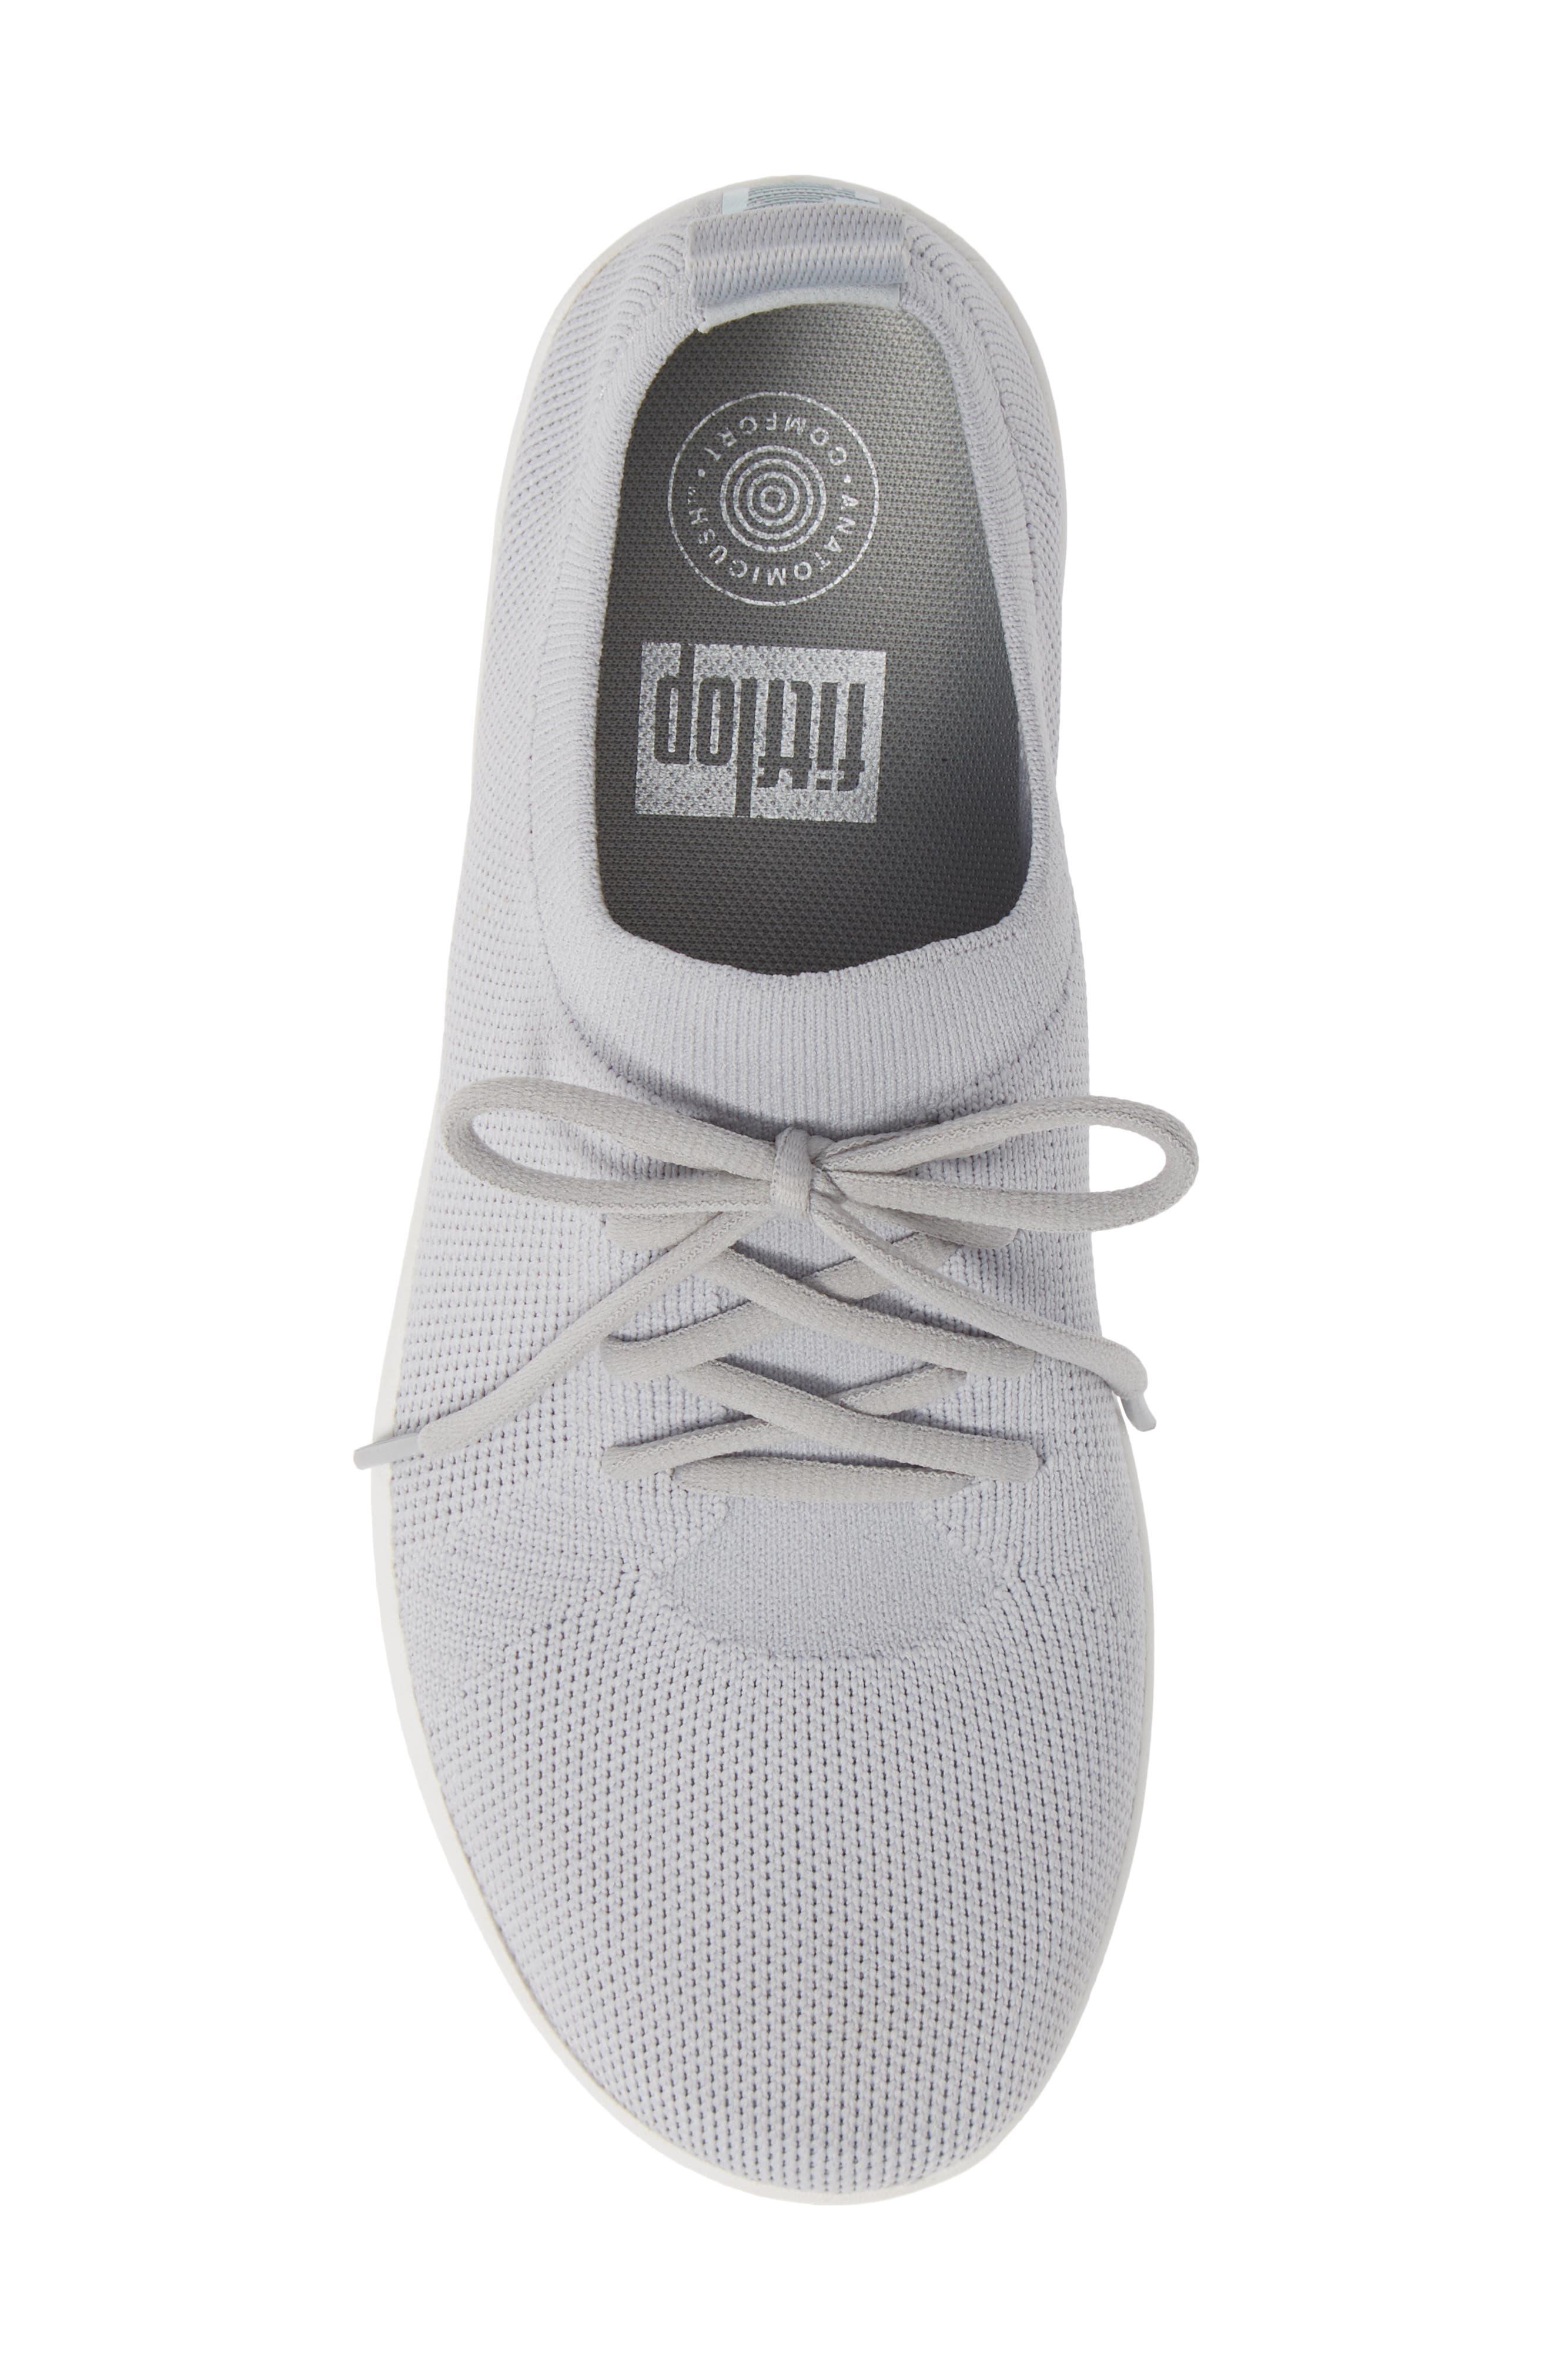 F-Sporty Uberknit<sup>™</sup> Sneaker,                             Alternate thumbnail 5, color,                             PEARL FABRIC